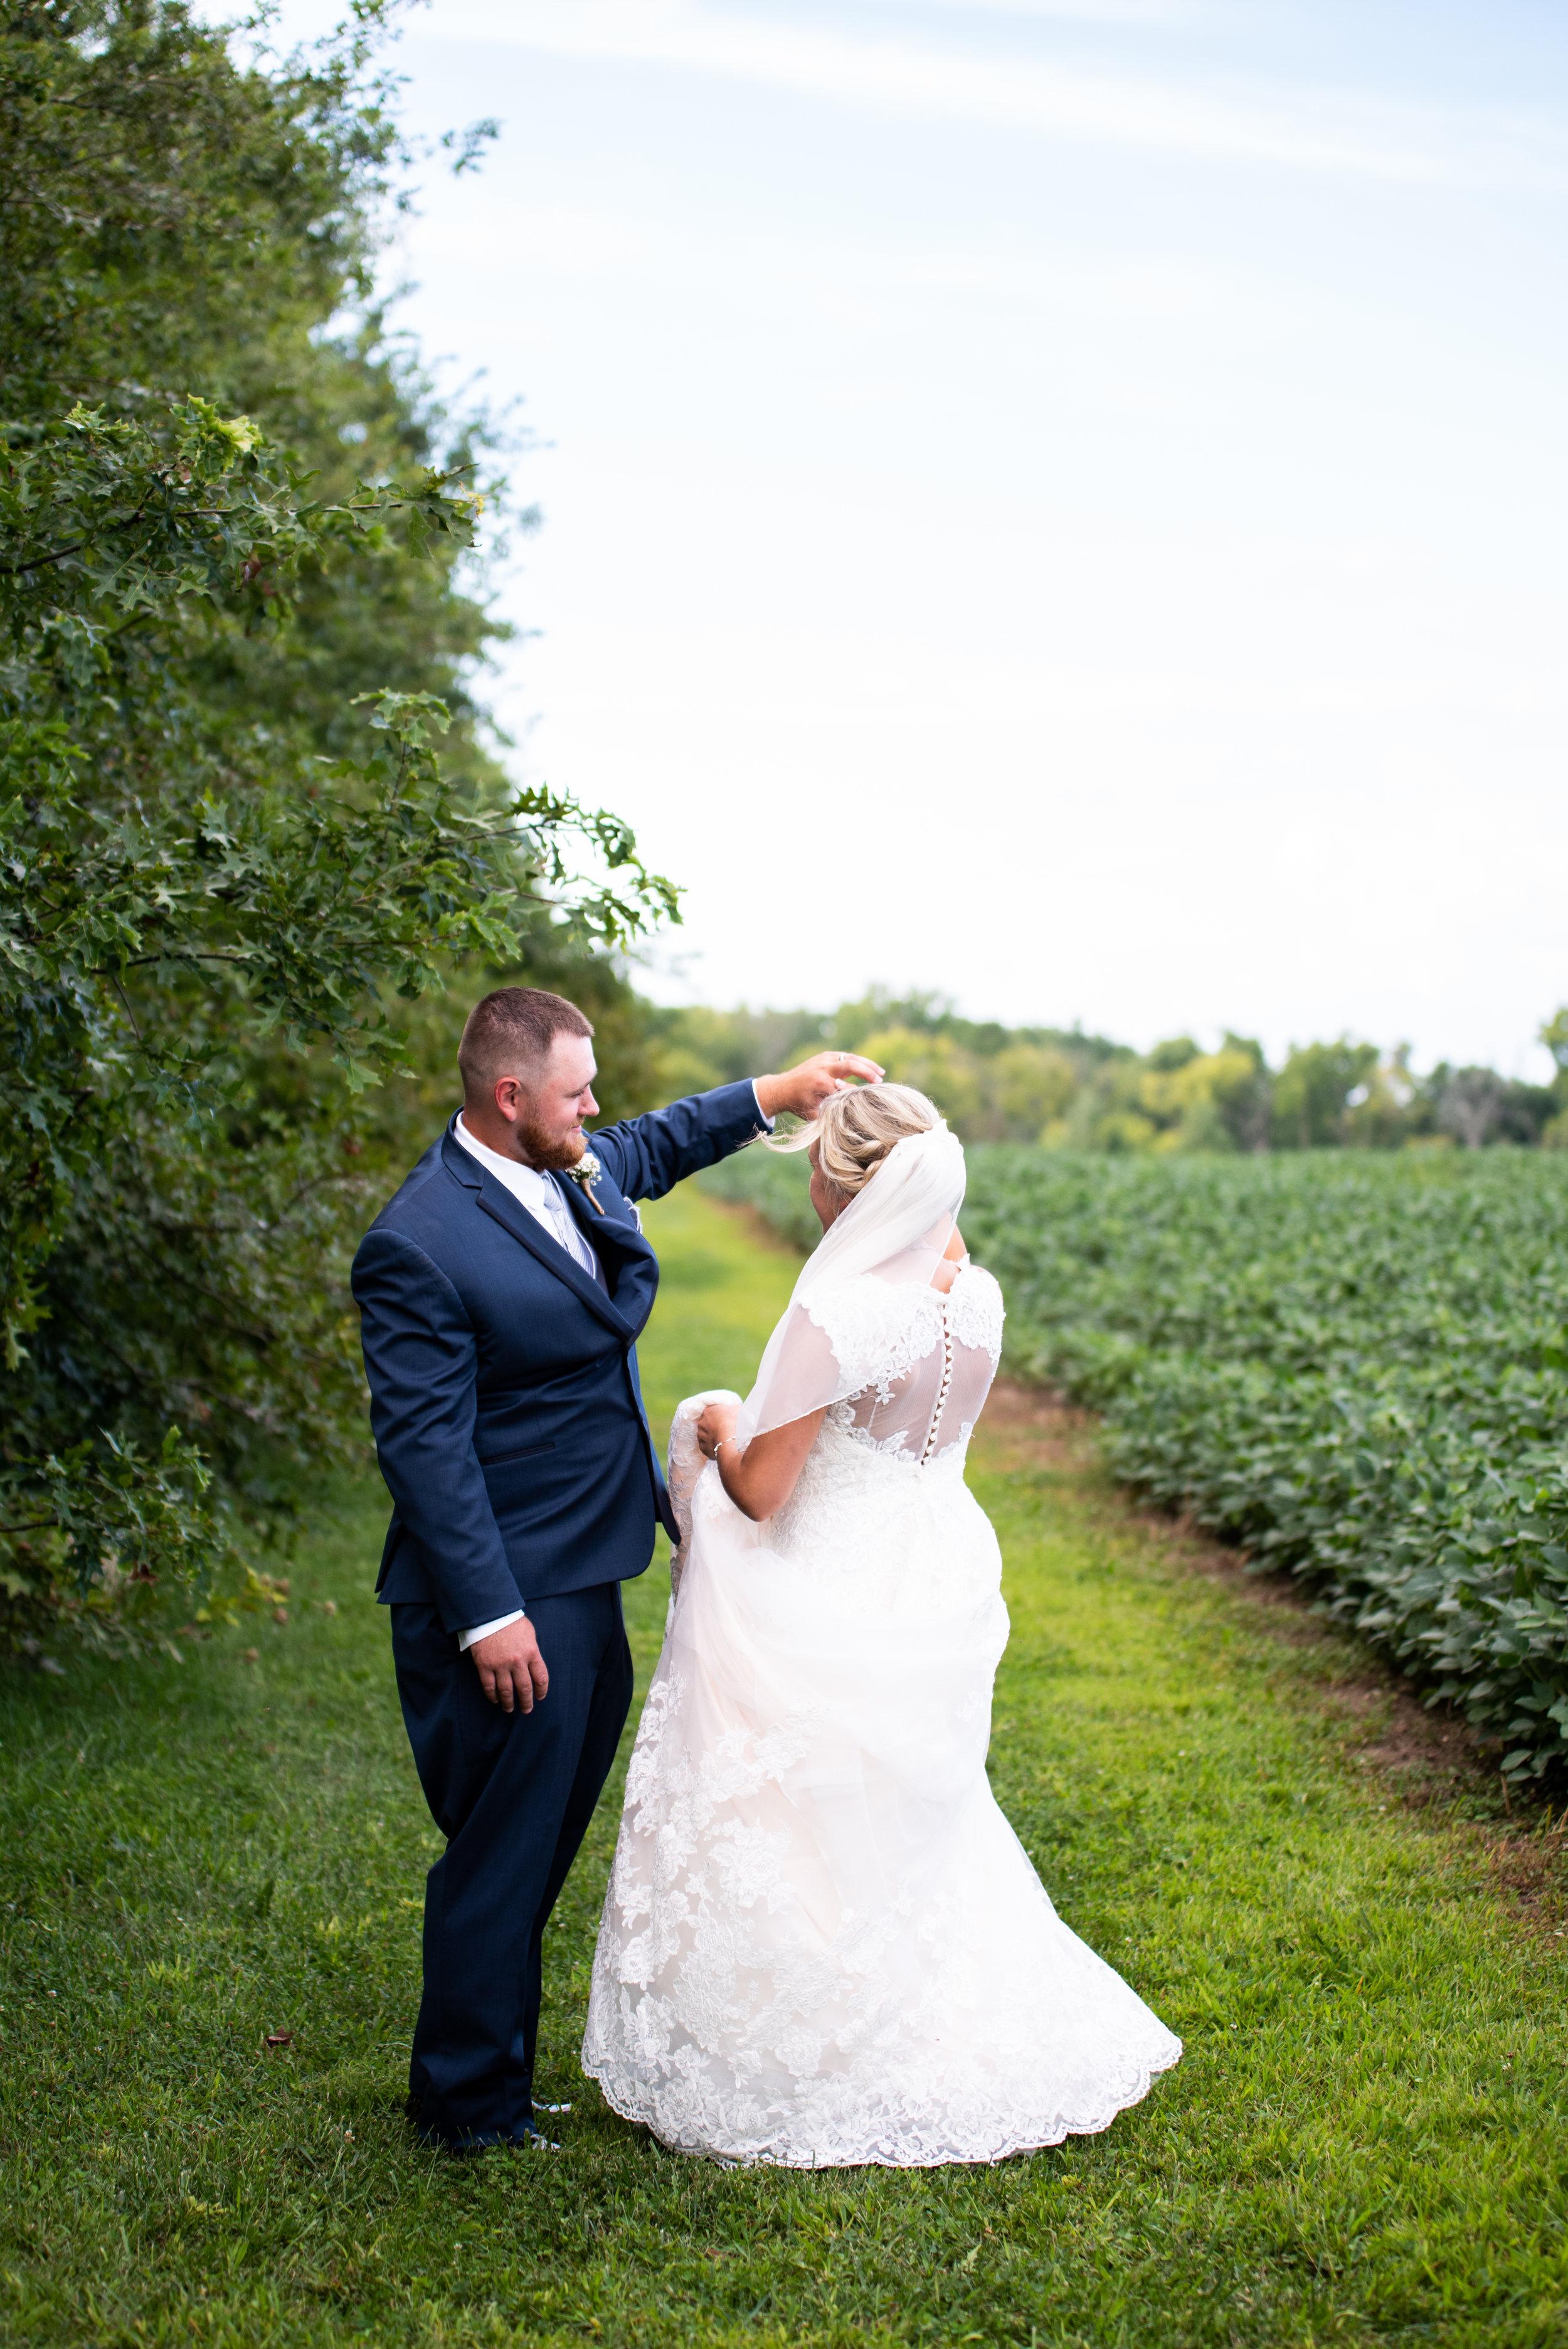 wedding (1 of 1)-162.jpg